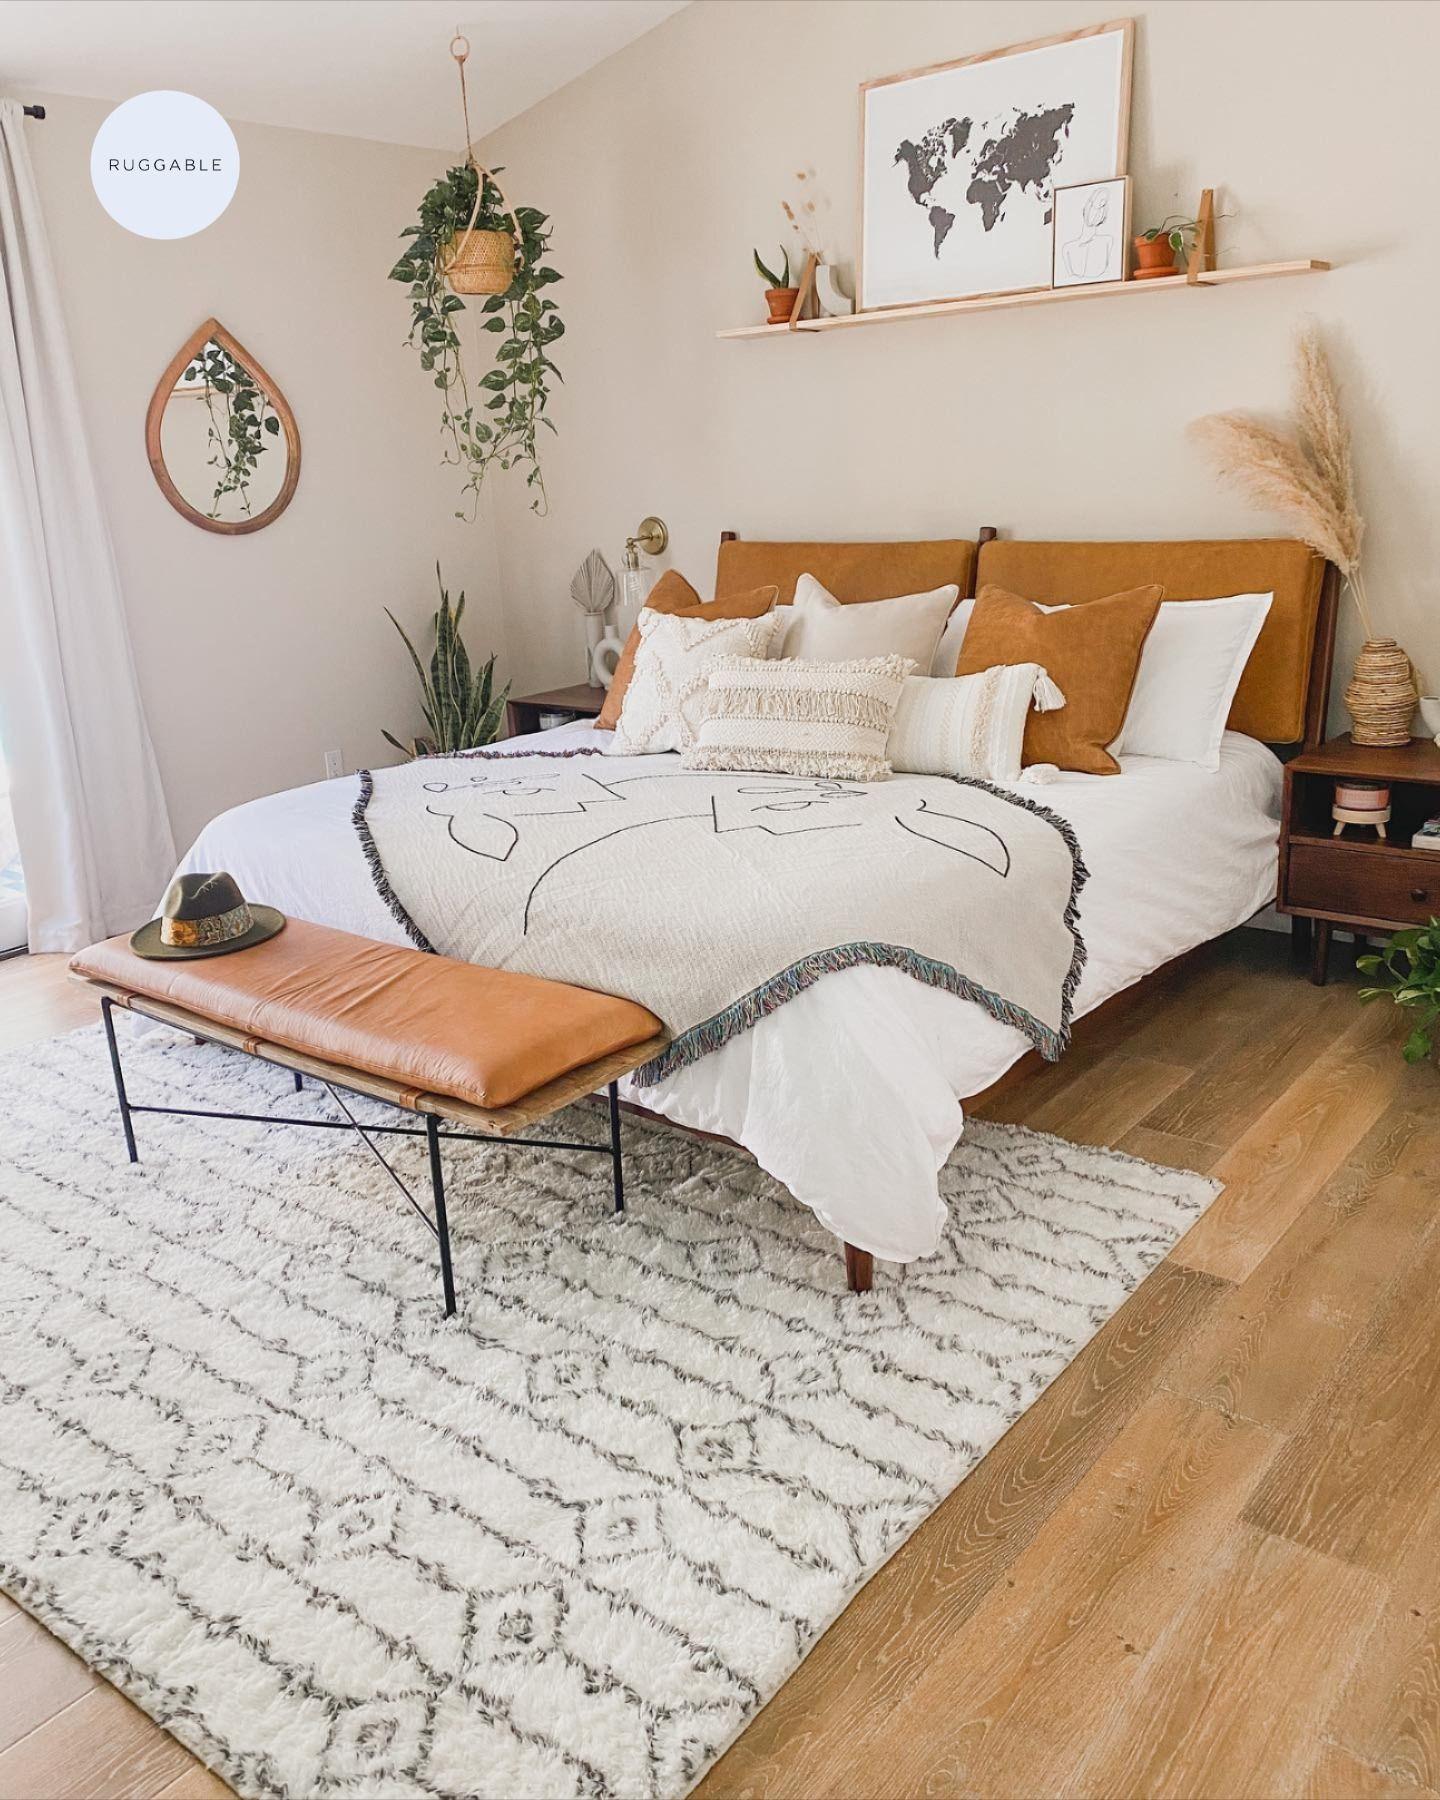 Plush Moroccan Ornate Rug In 2020 Bedroom Interior Room Ideas Bedroom Bedroom Makeover